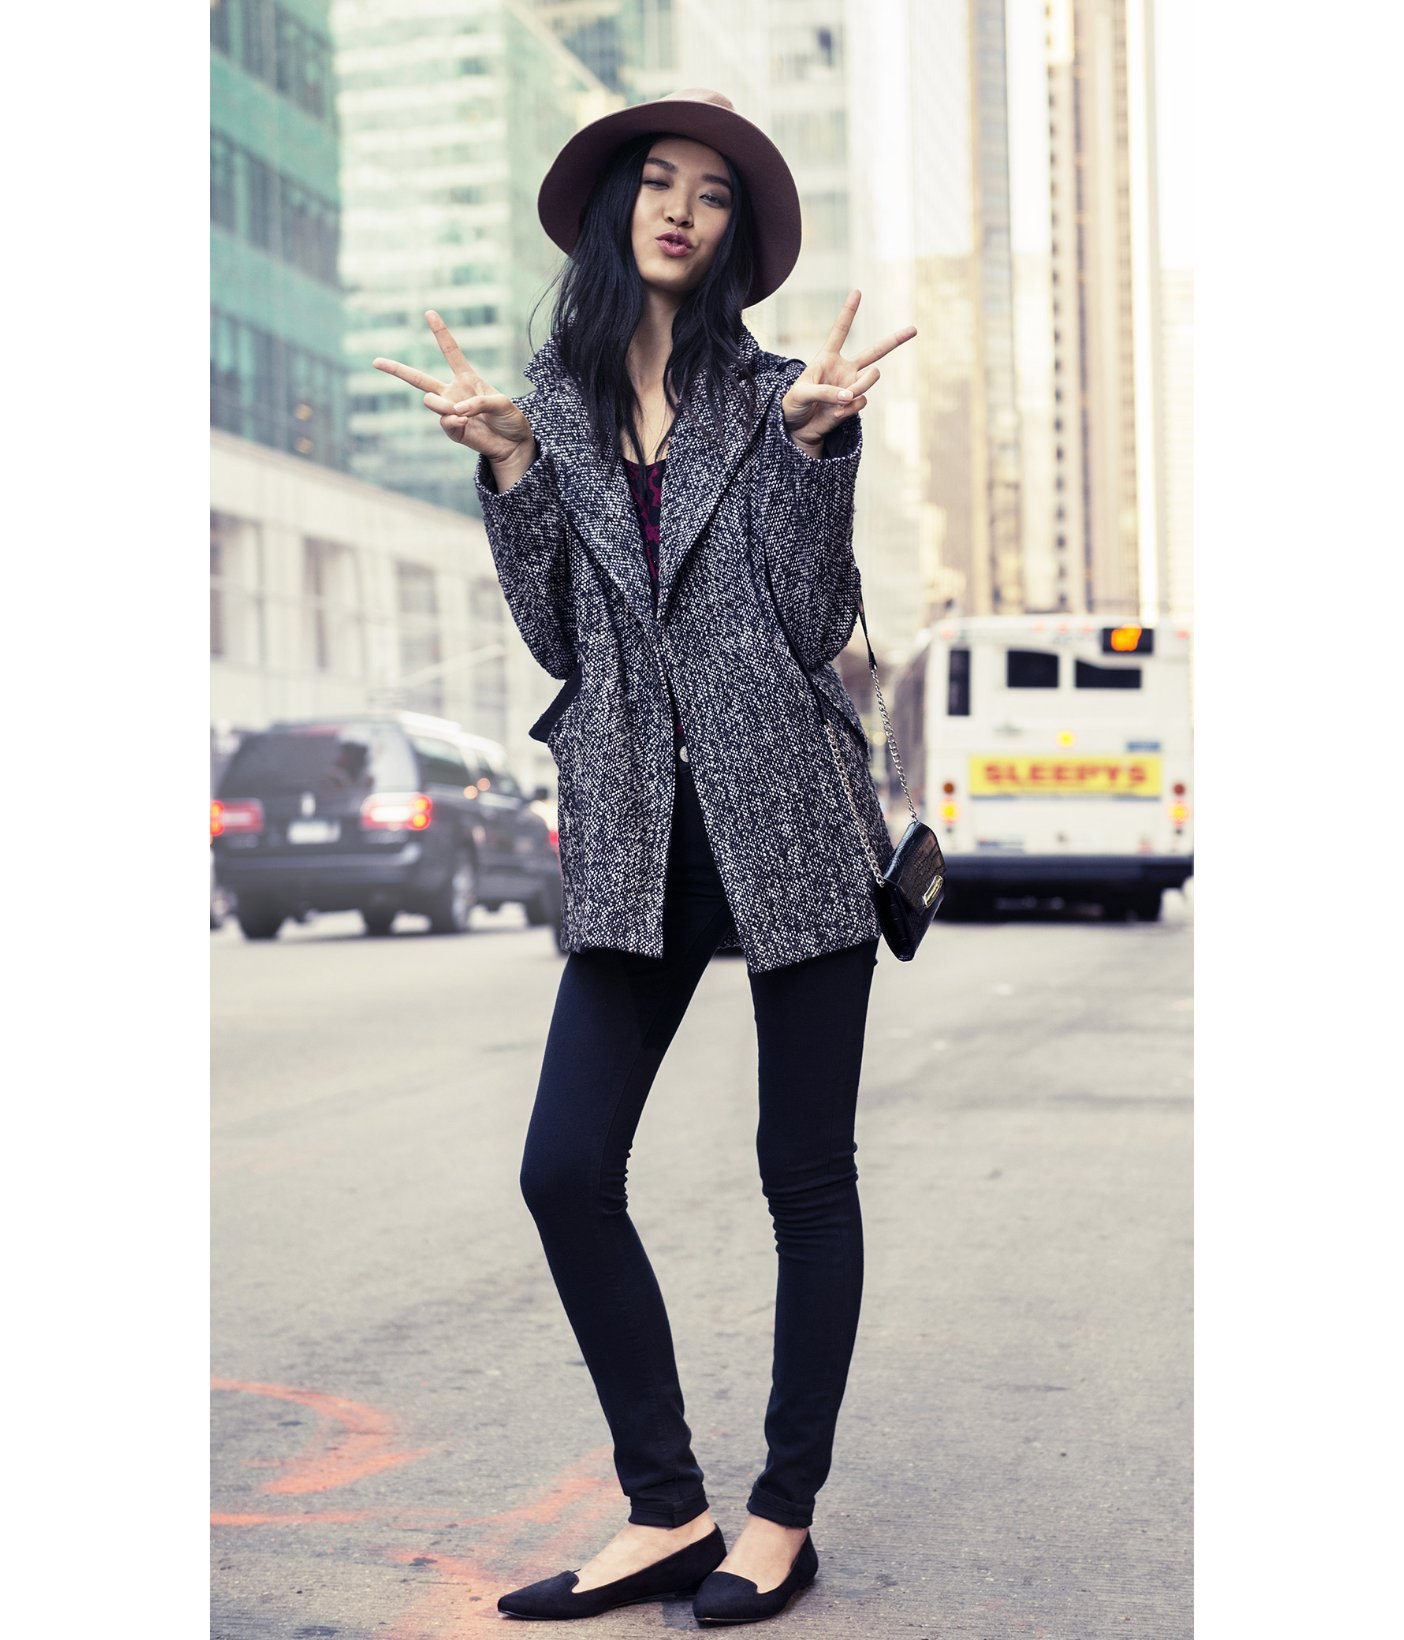 Lyst - Express Wool Felt Fedora Hat in Black 5fd9bbe876f